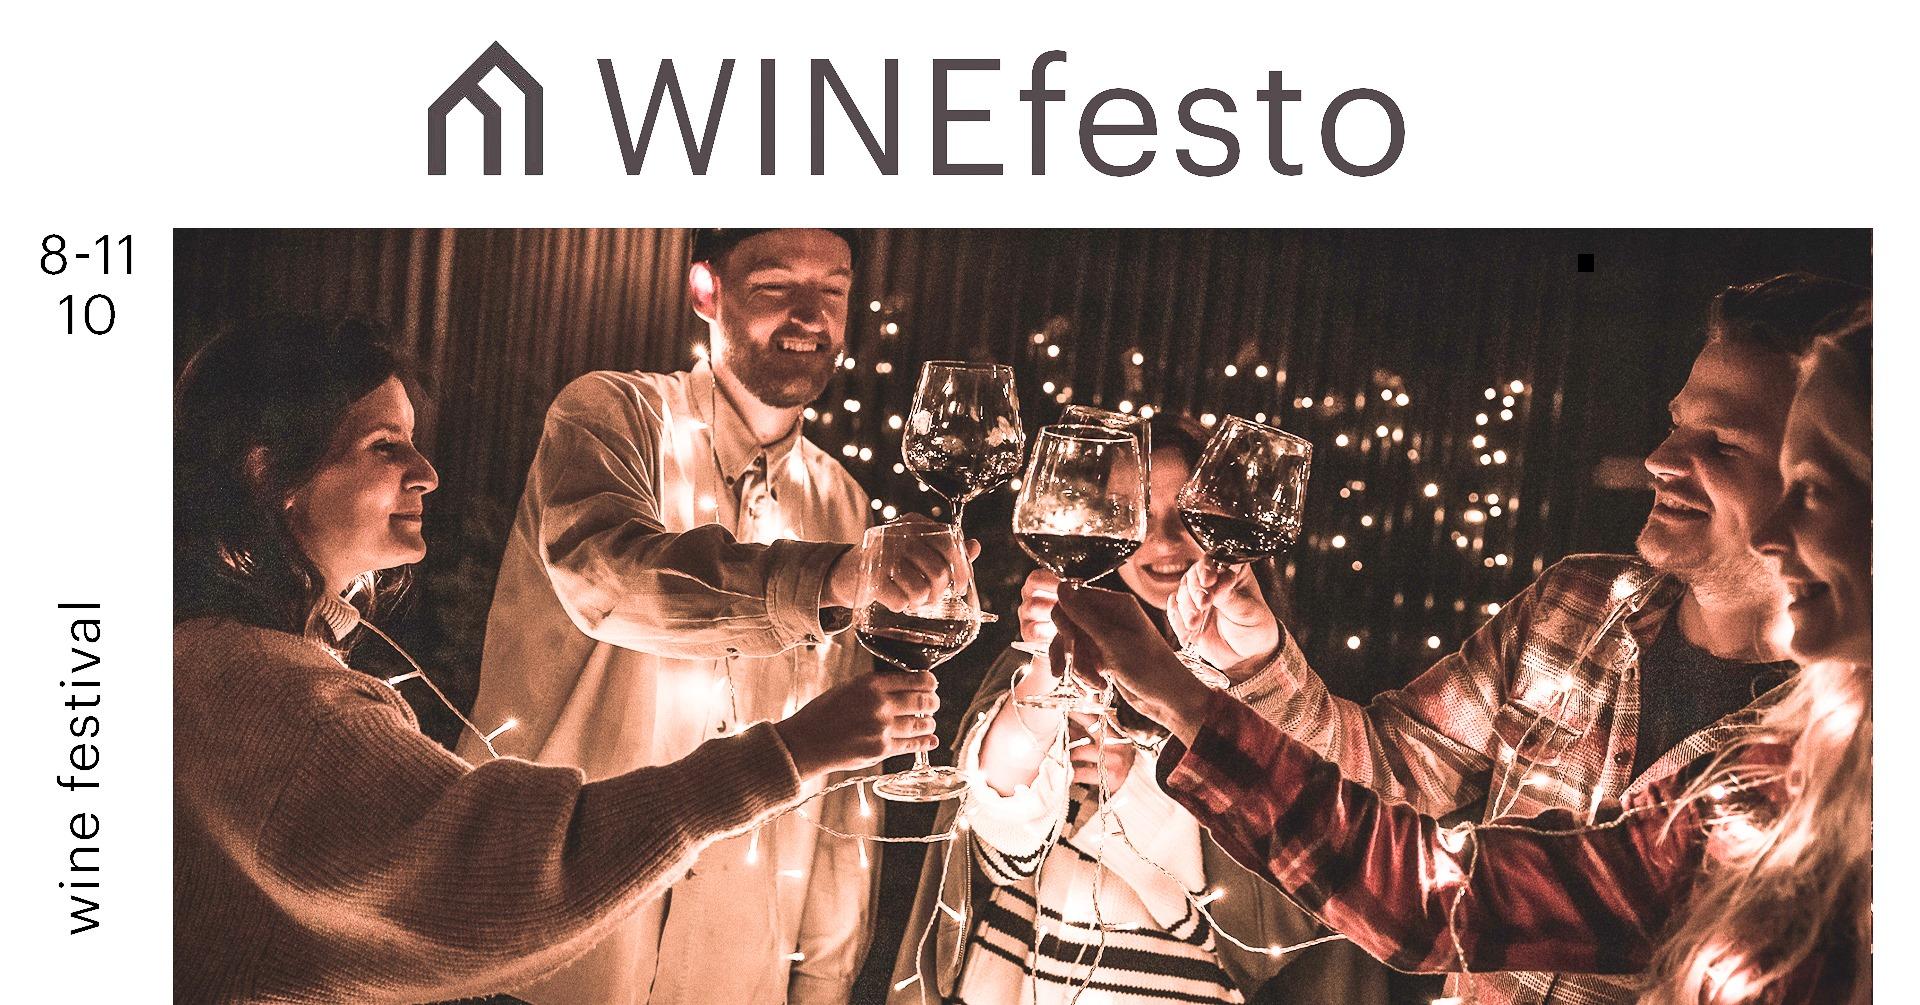 WINEfesto - Smíchov